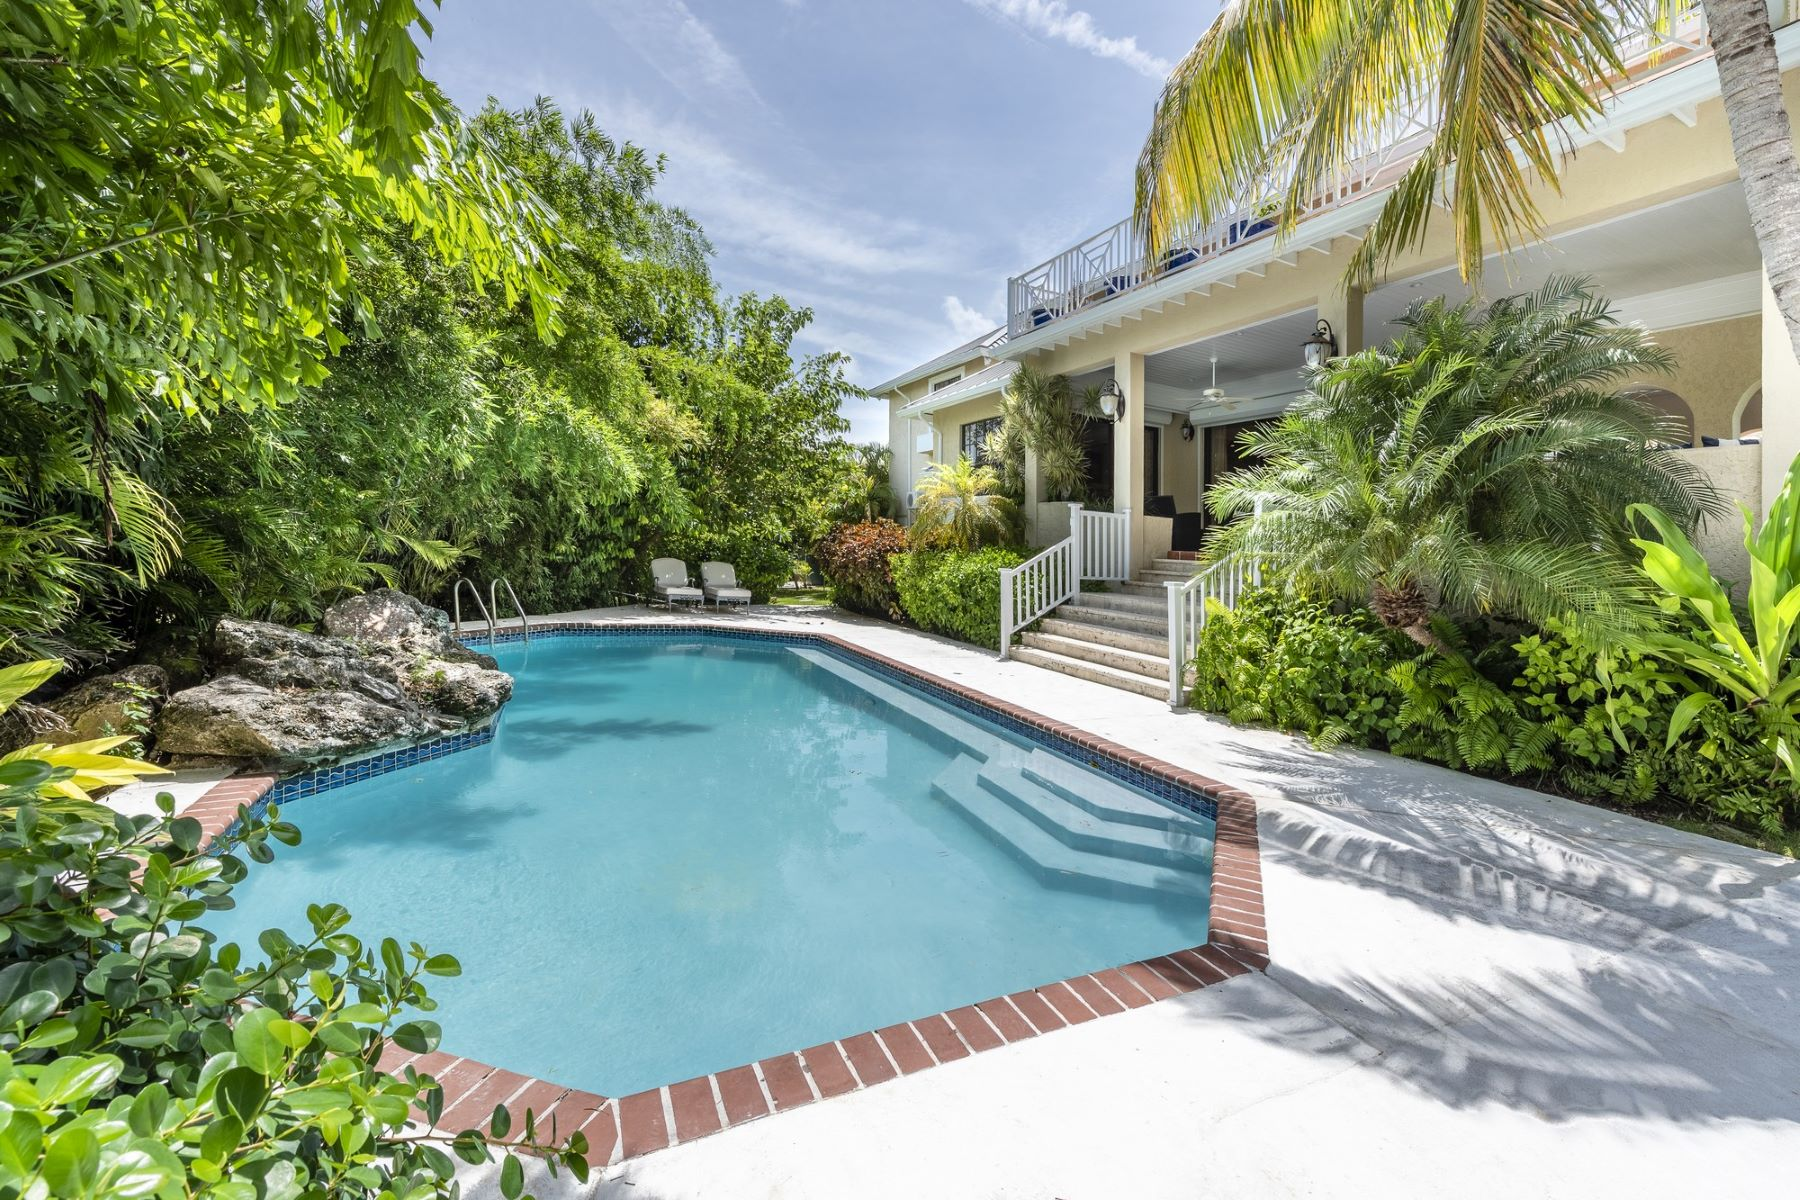 Single Family Home for Sale at Lyford Cay Hakuna Matata Lyford Cay, Nassau And Paradise Island 0 Bahamas